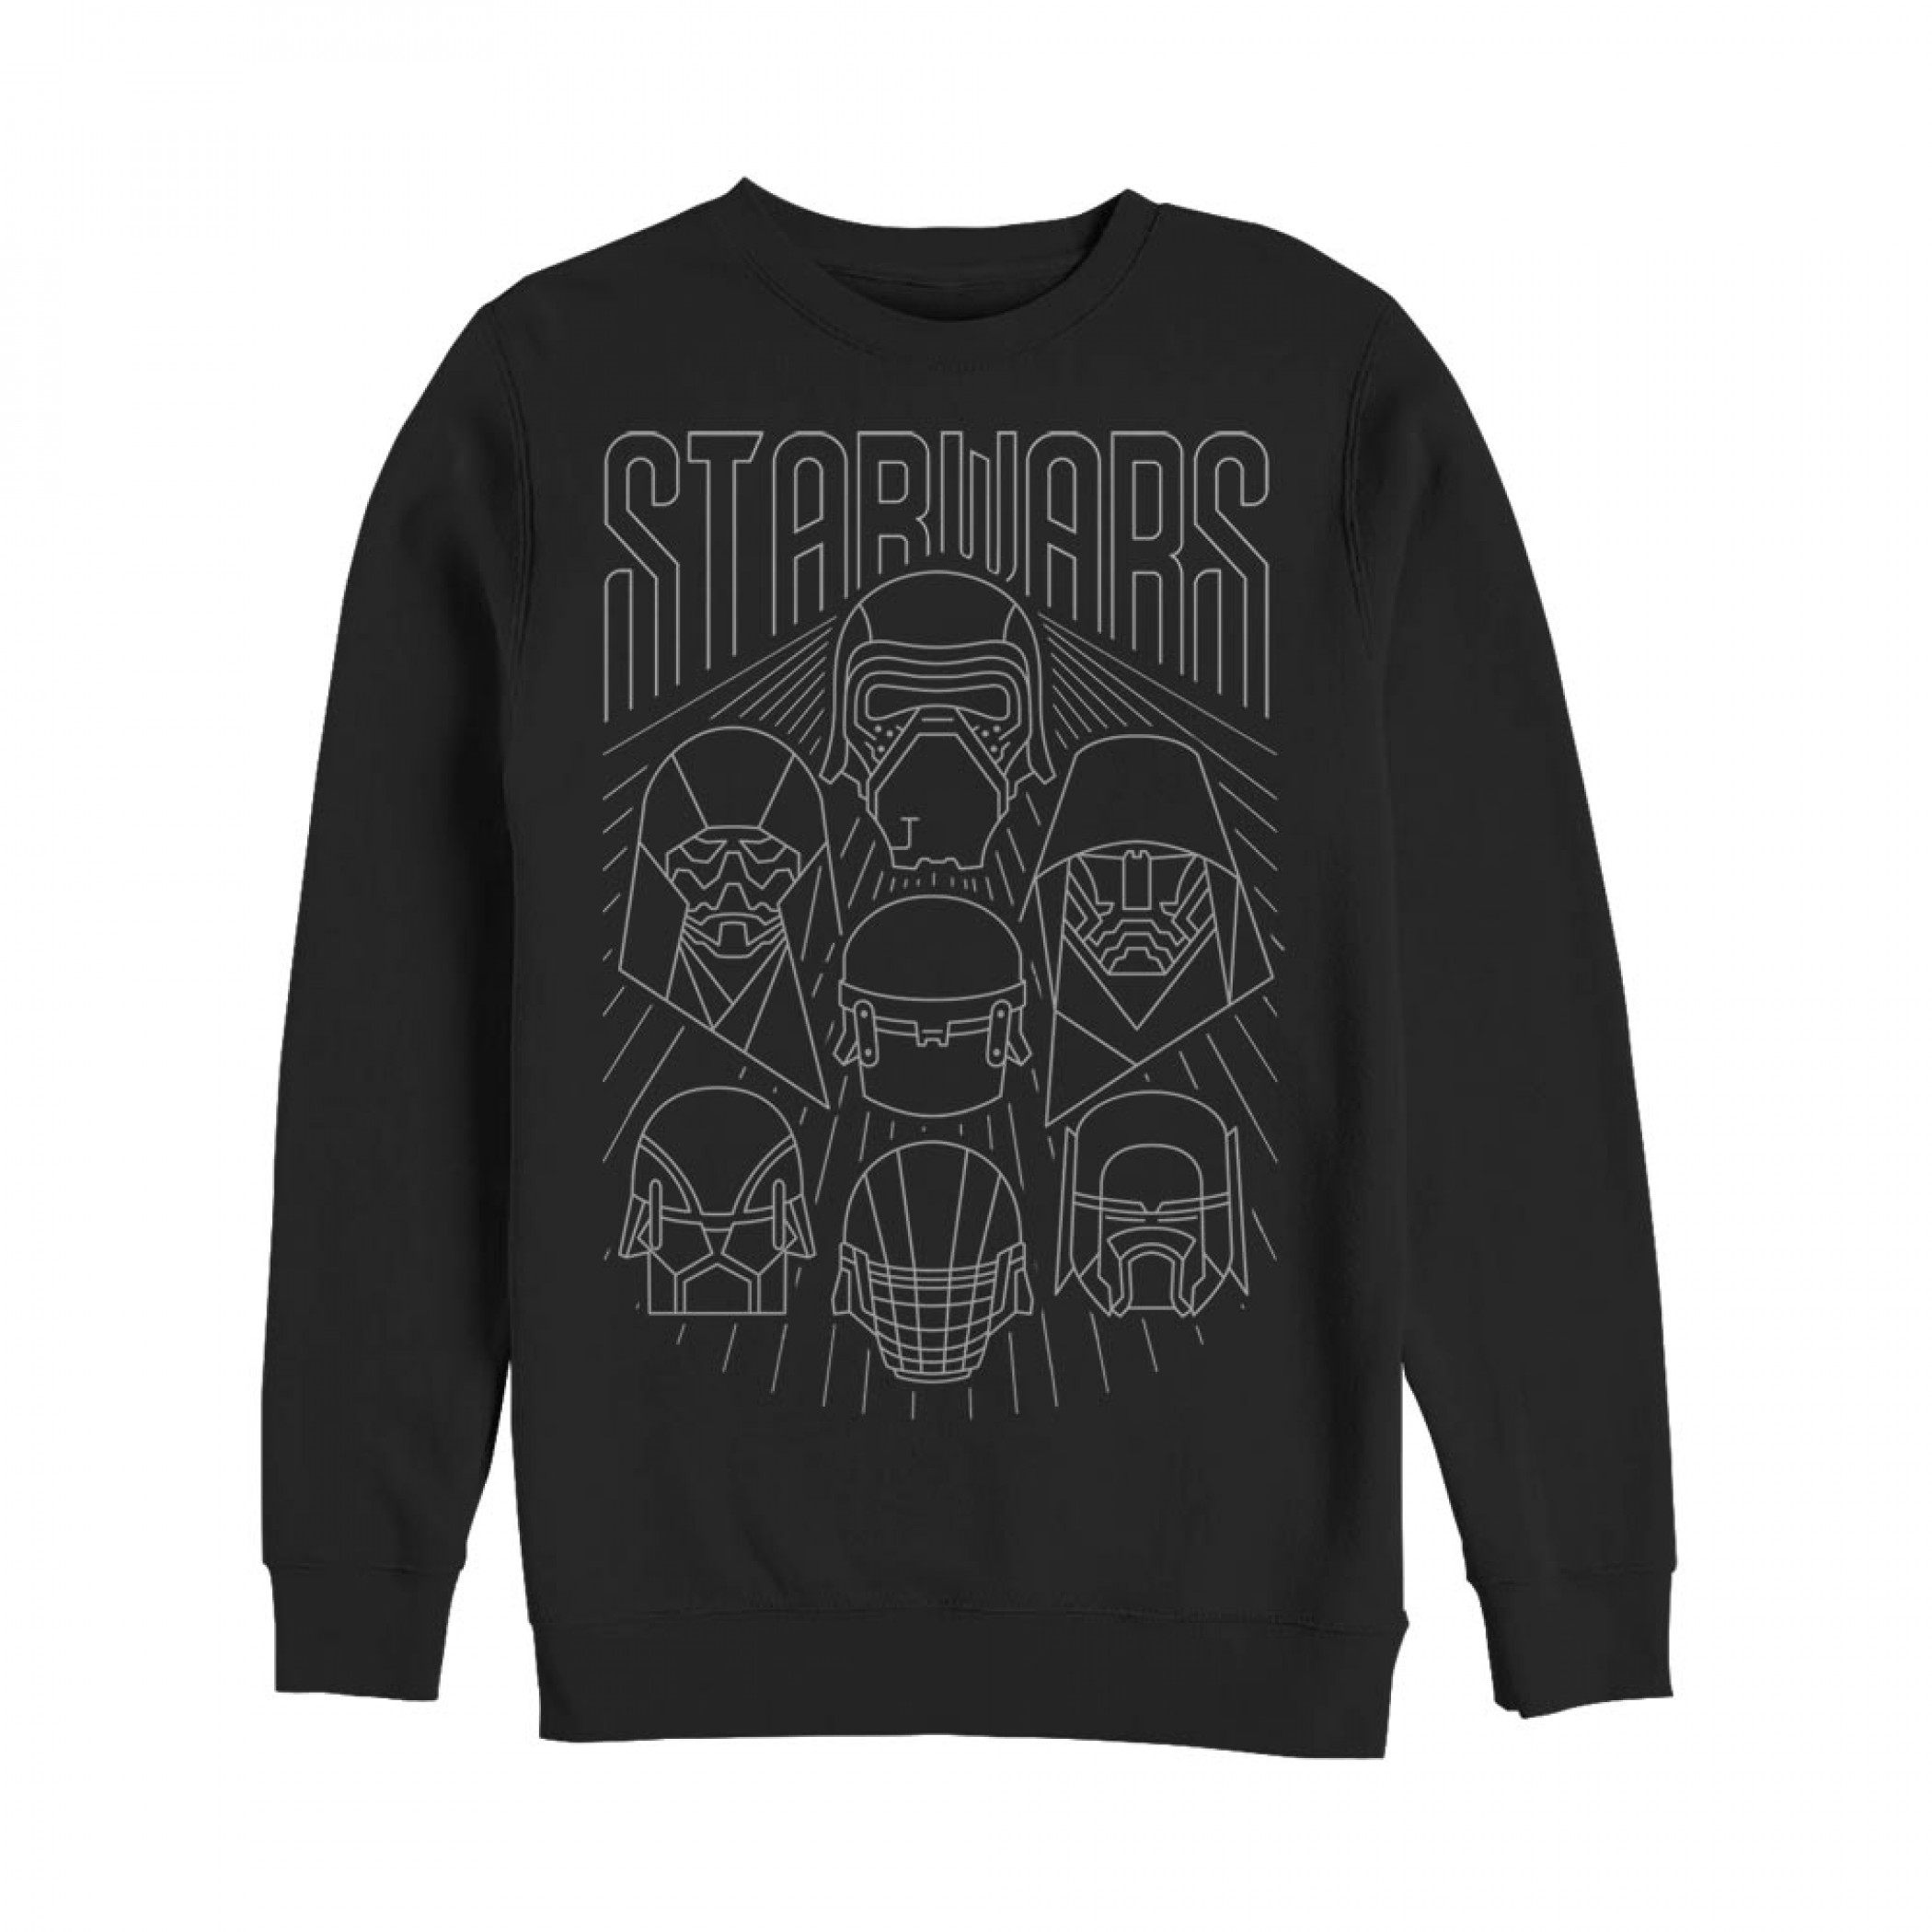 Star Wars The Rise of Skywalker Dark Side Sweatshirt